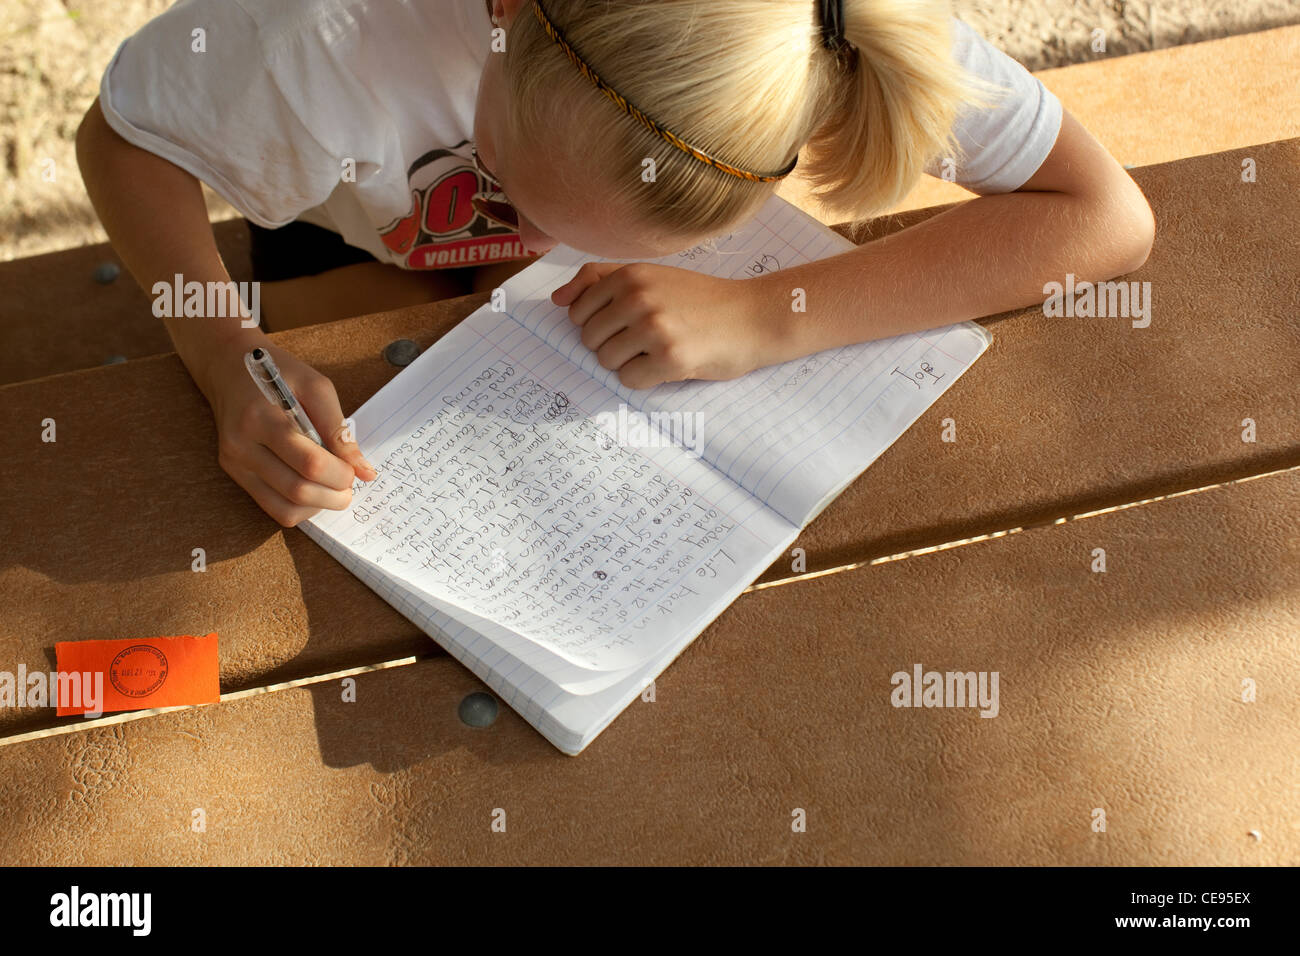 Teenager Mittelschule Schüler Hand schreibt Bericht auf camping Schulausflug zum Big Bend National Park in Texas Stockfoto